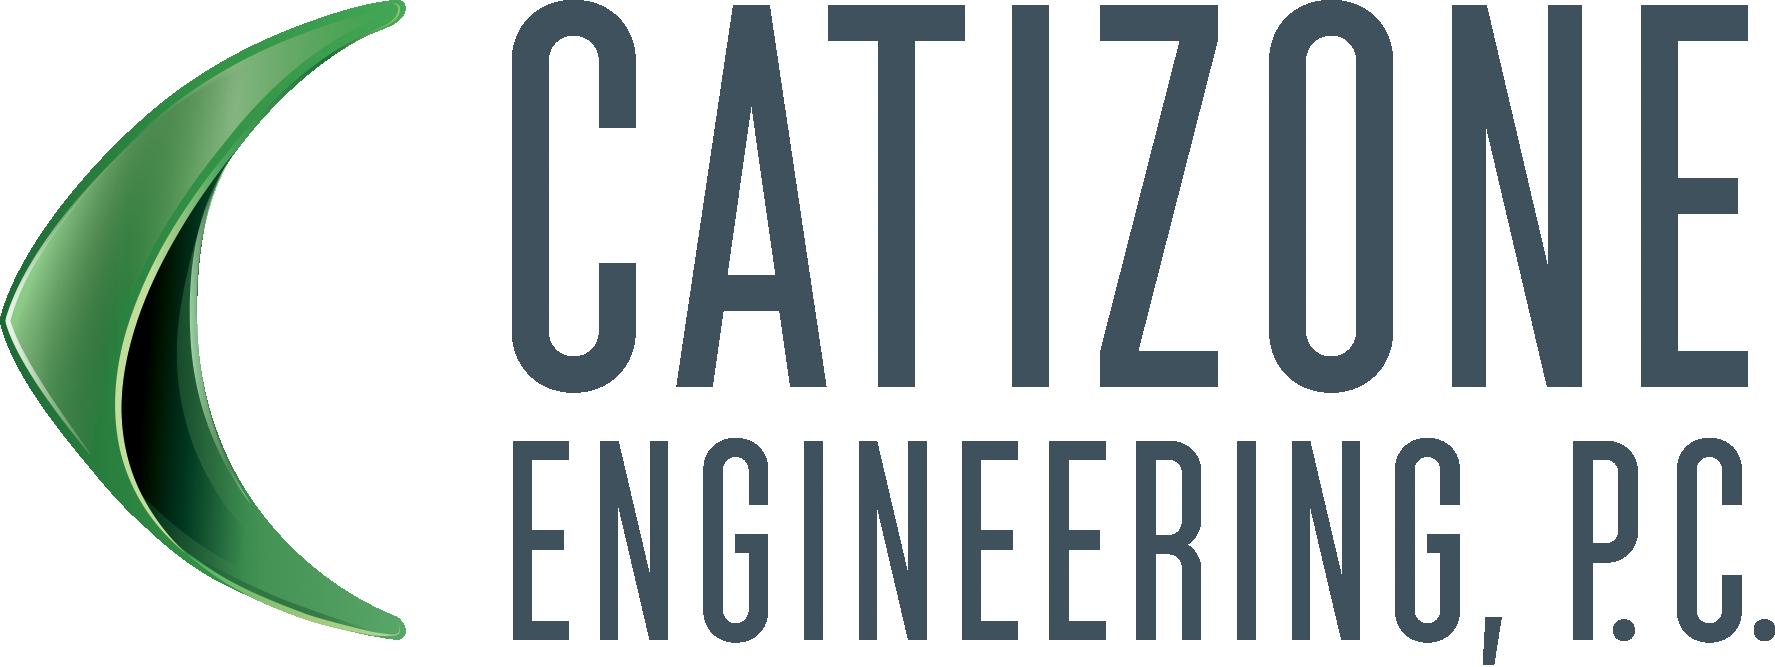 Catizone Engineering P.C.